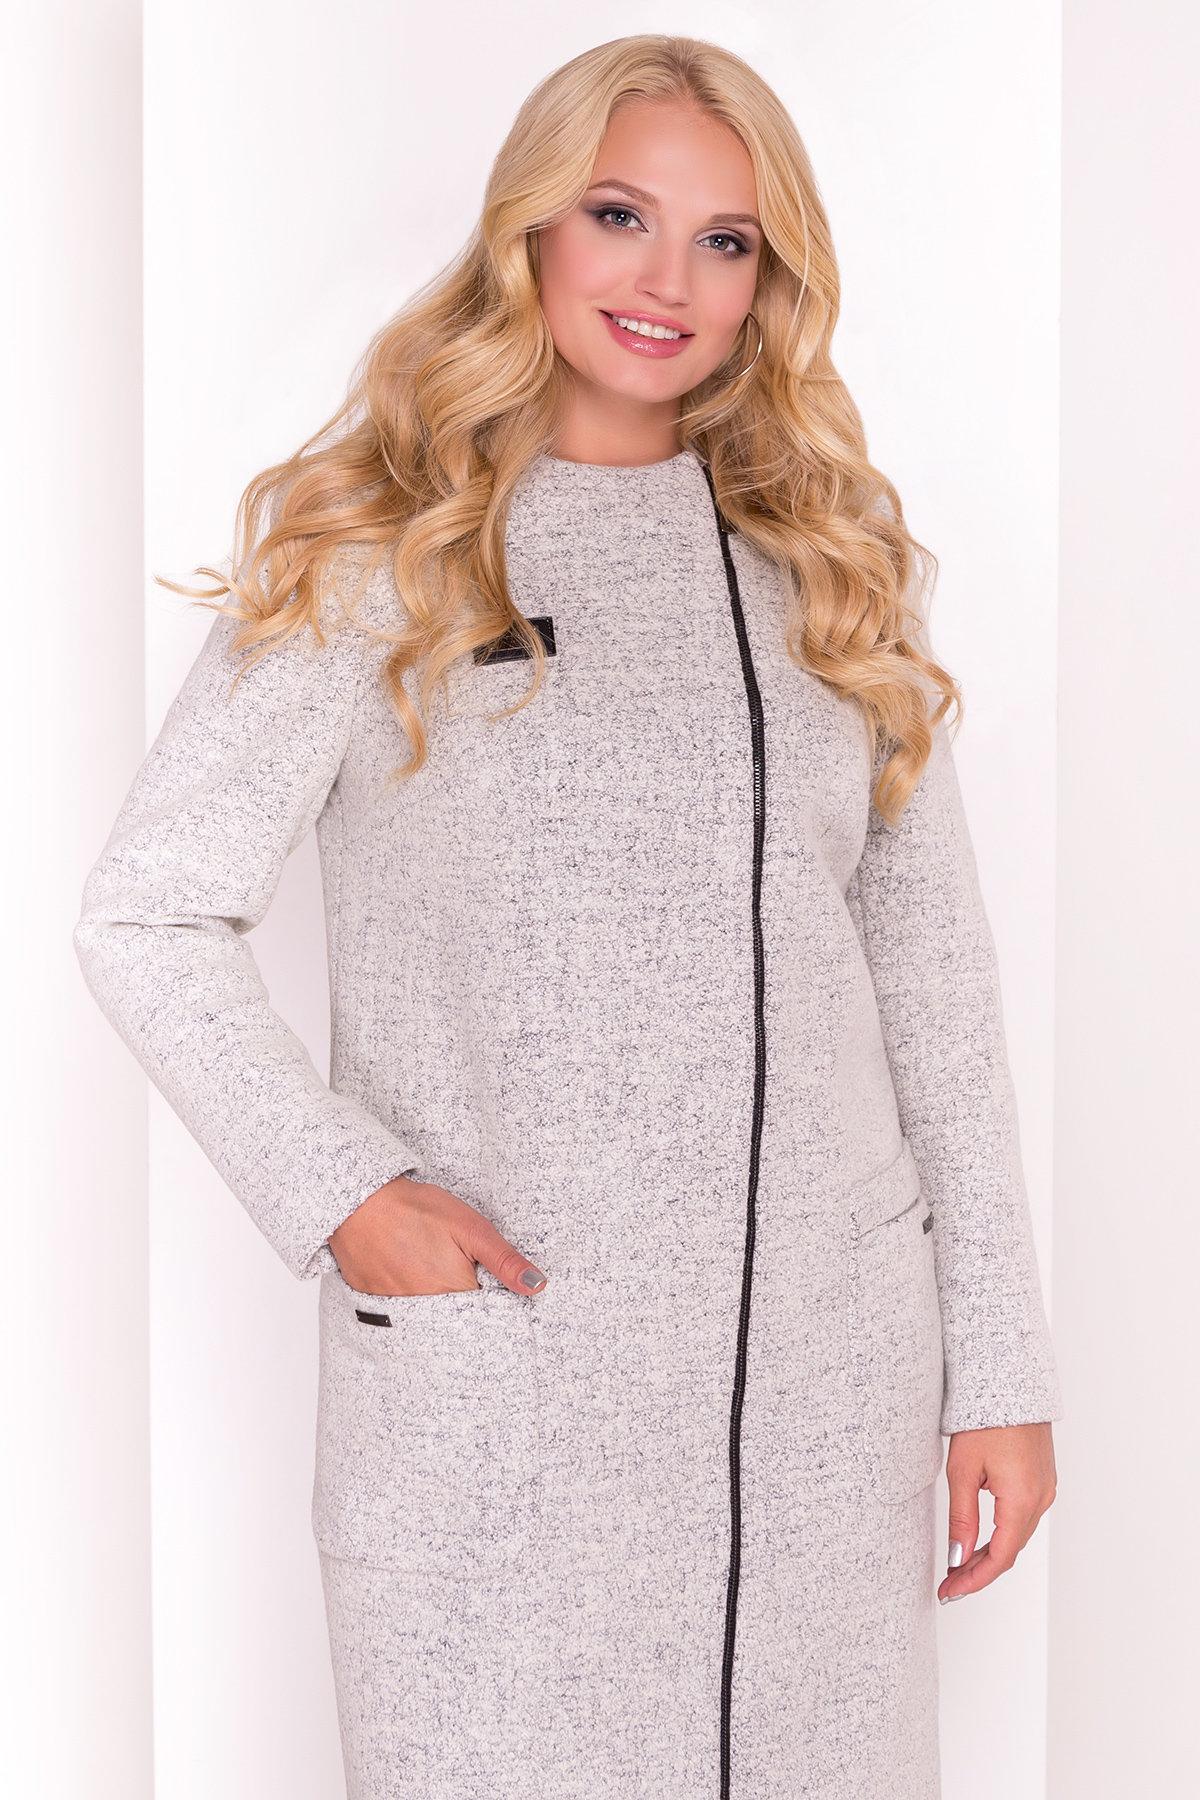 Пальто Милтон Donna 3376 Цвет: Светло-серый 47